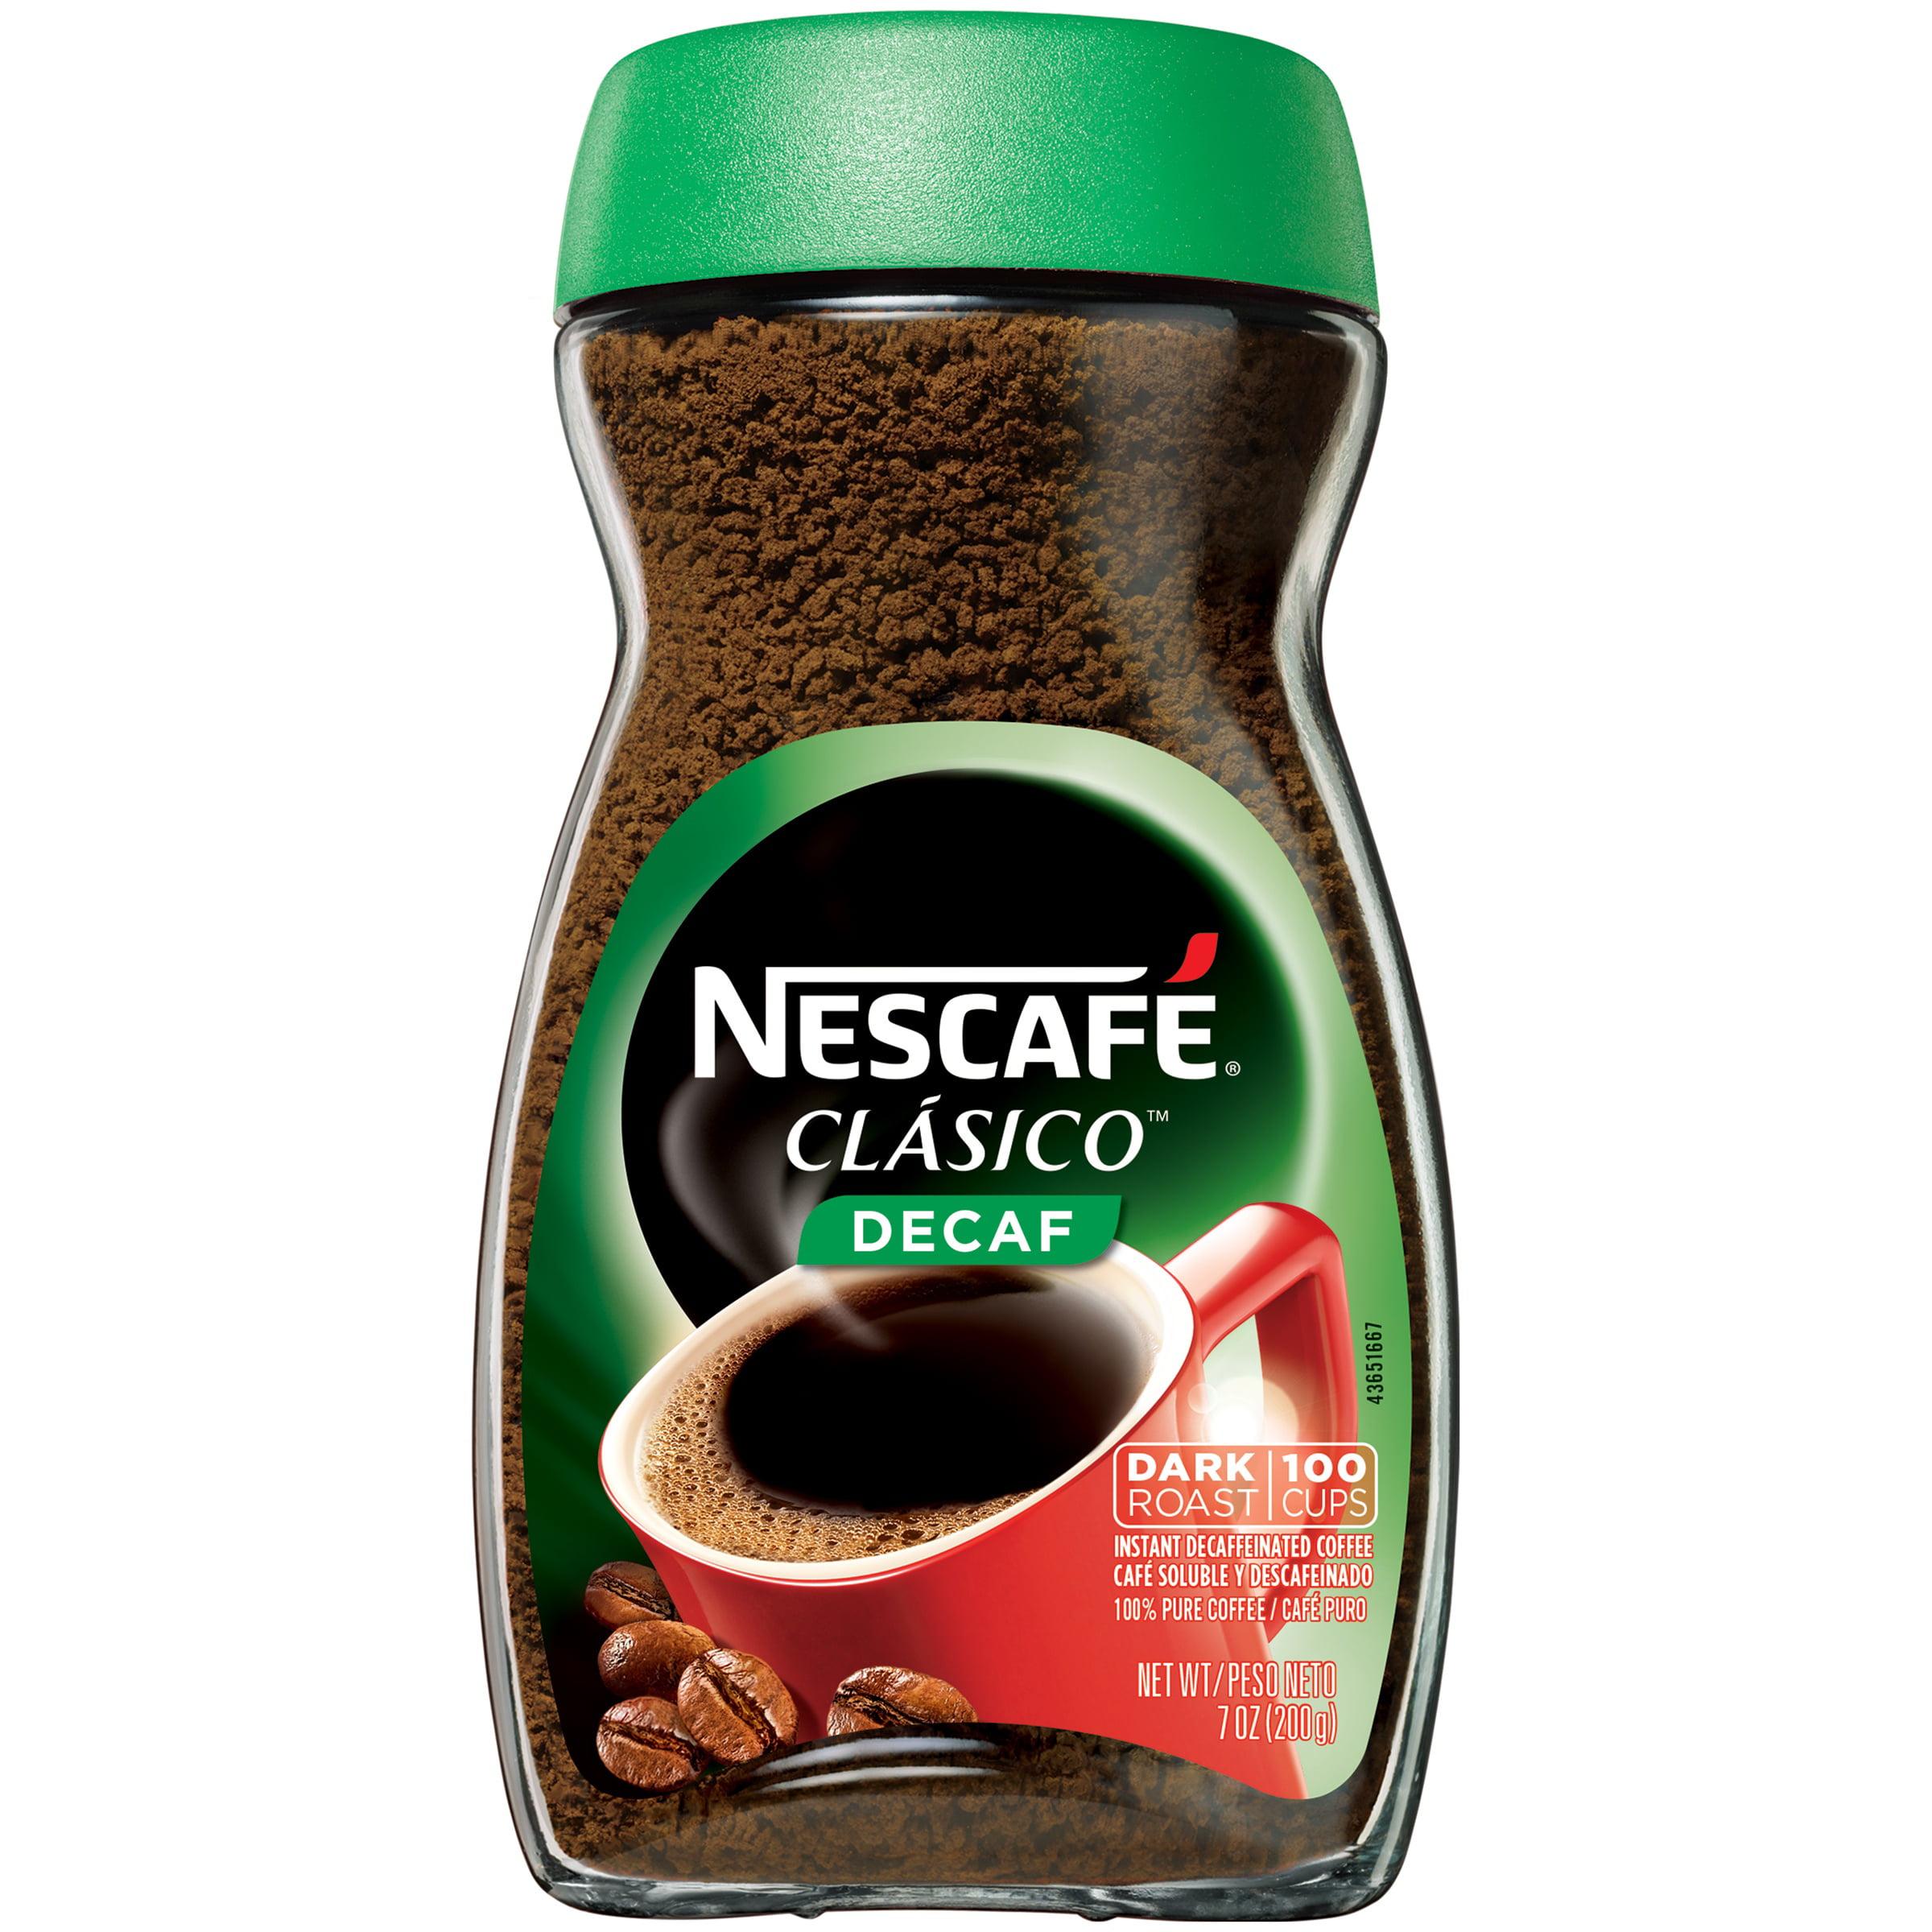 NESCAFE CLASICO Decaf Instant Coffee 7 oz. Jar